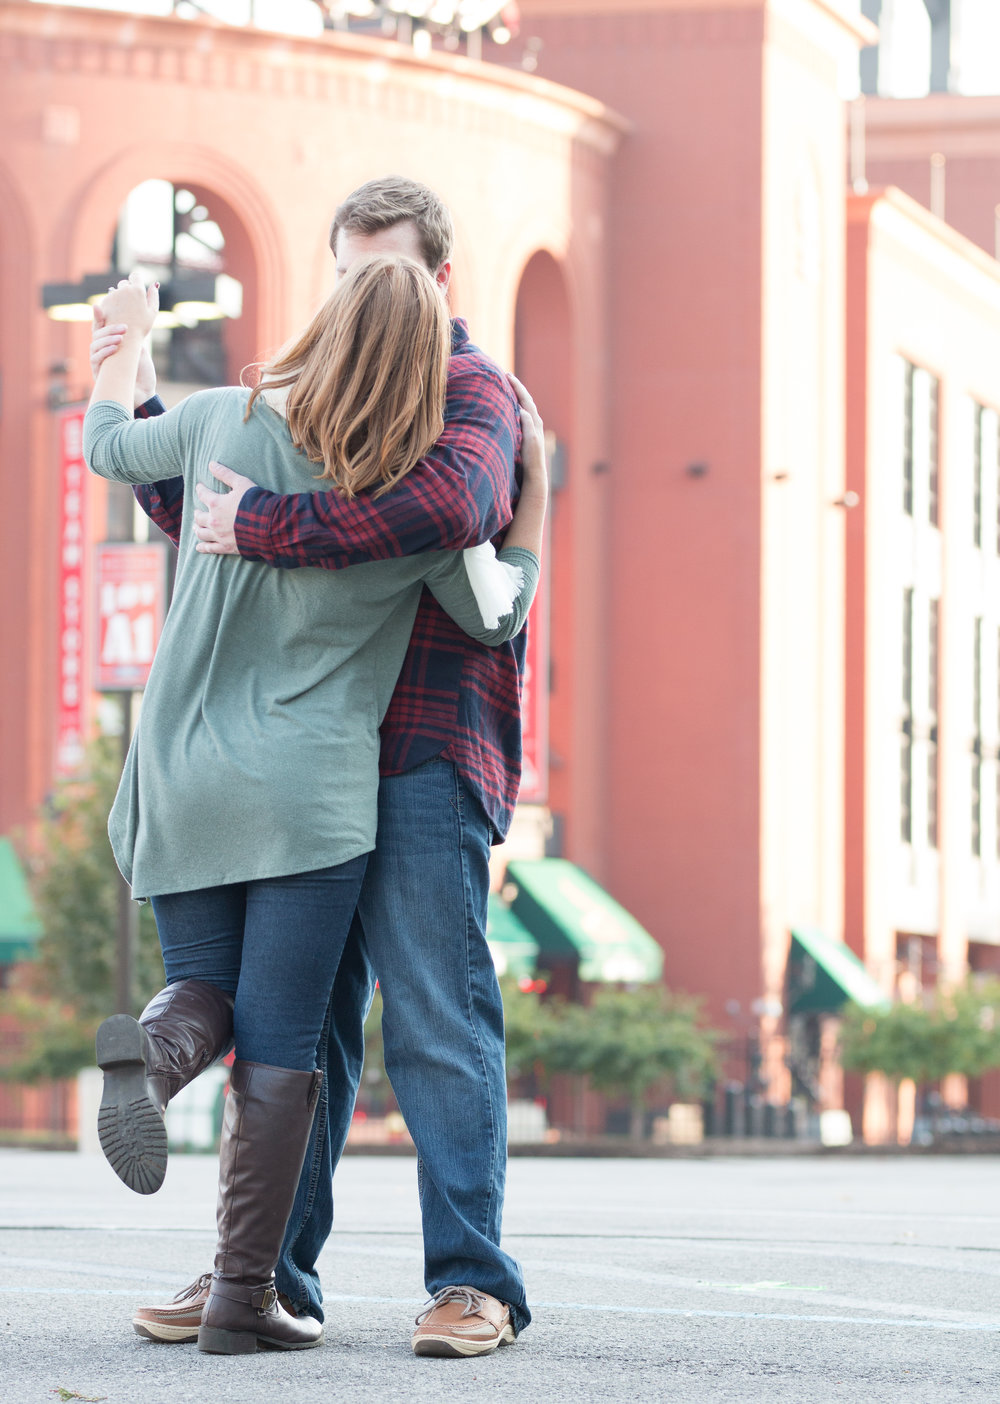 Nick & Miranda, high school sweethearts tying the knot in 2018 ...